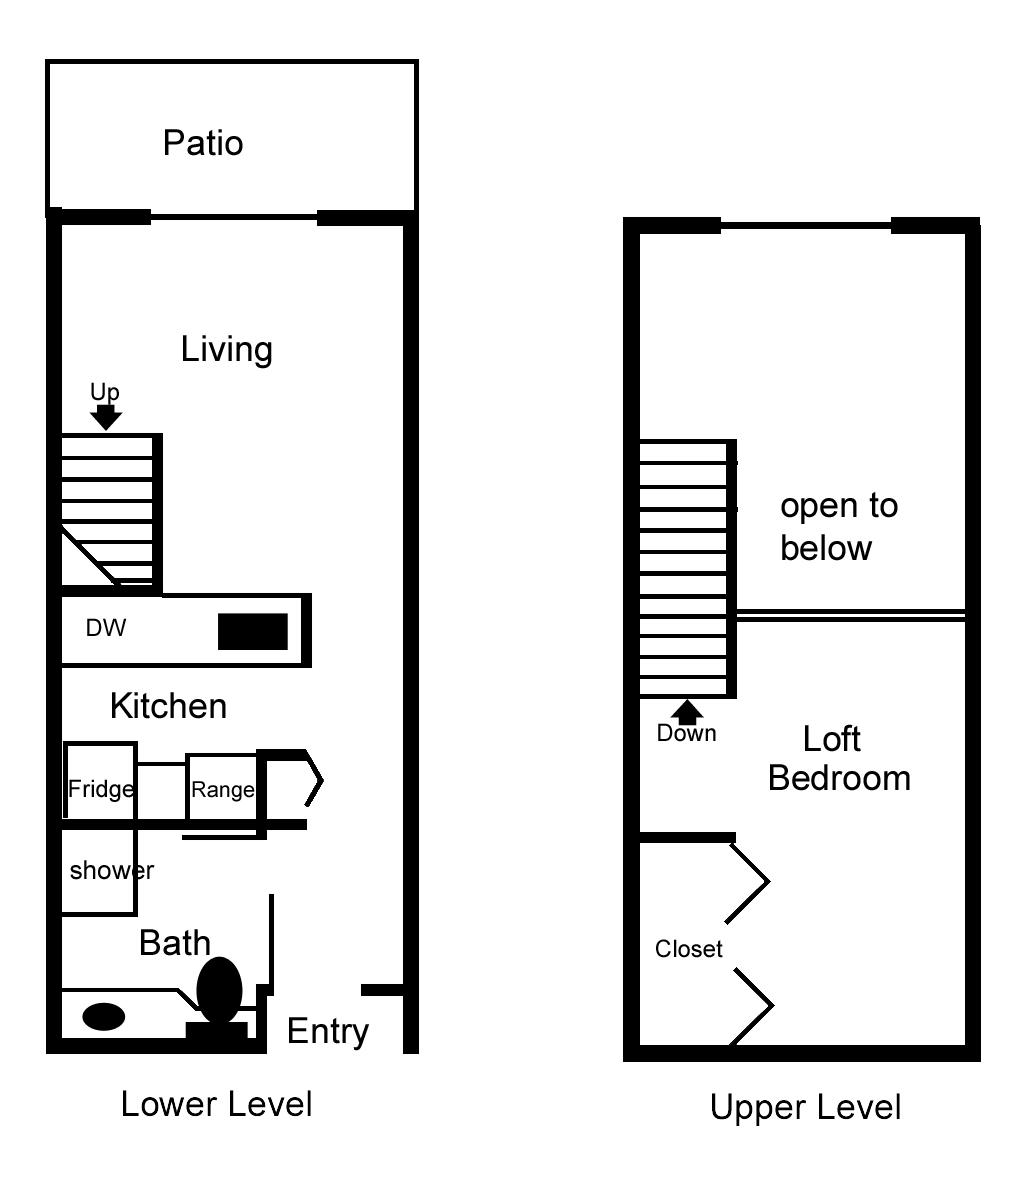 2 Bedroom Loft Apartment Floor Plans Viewing Gallery